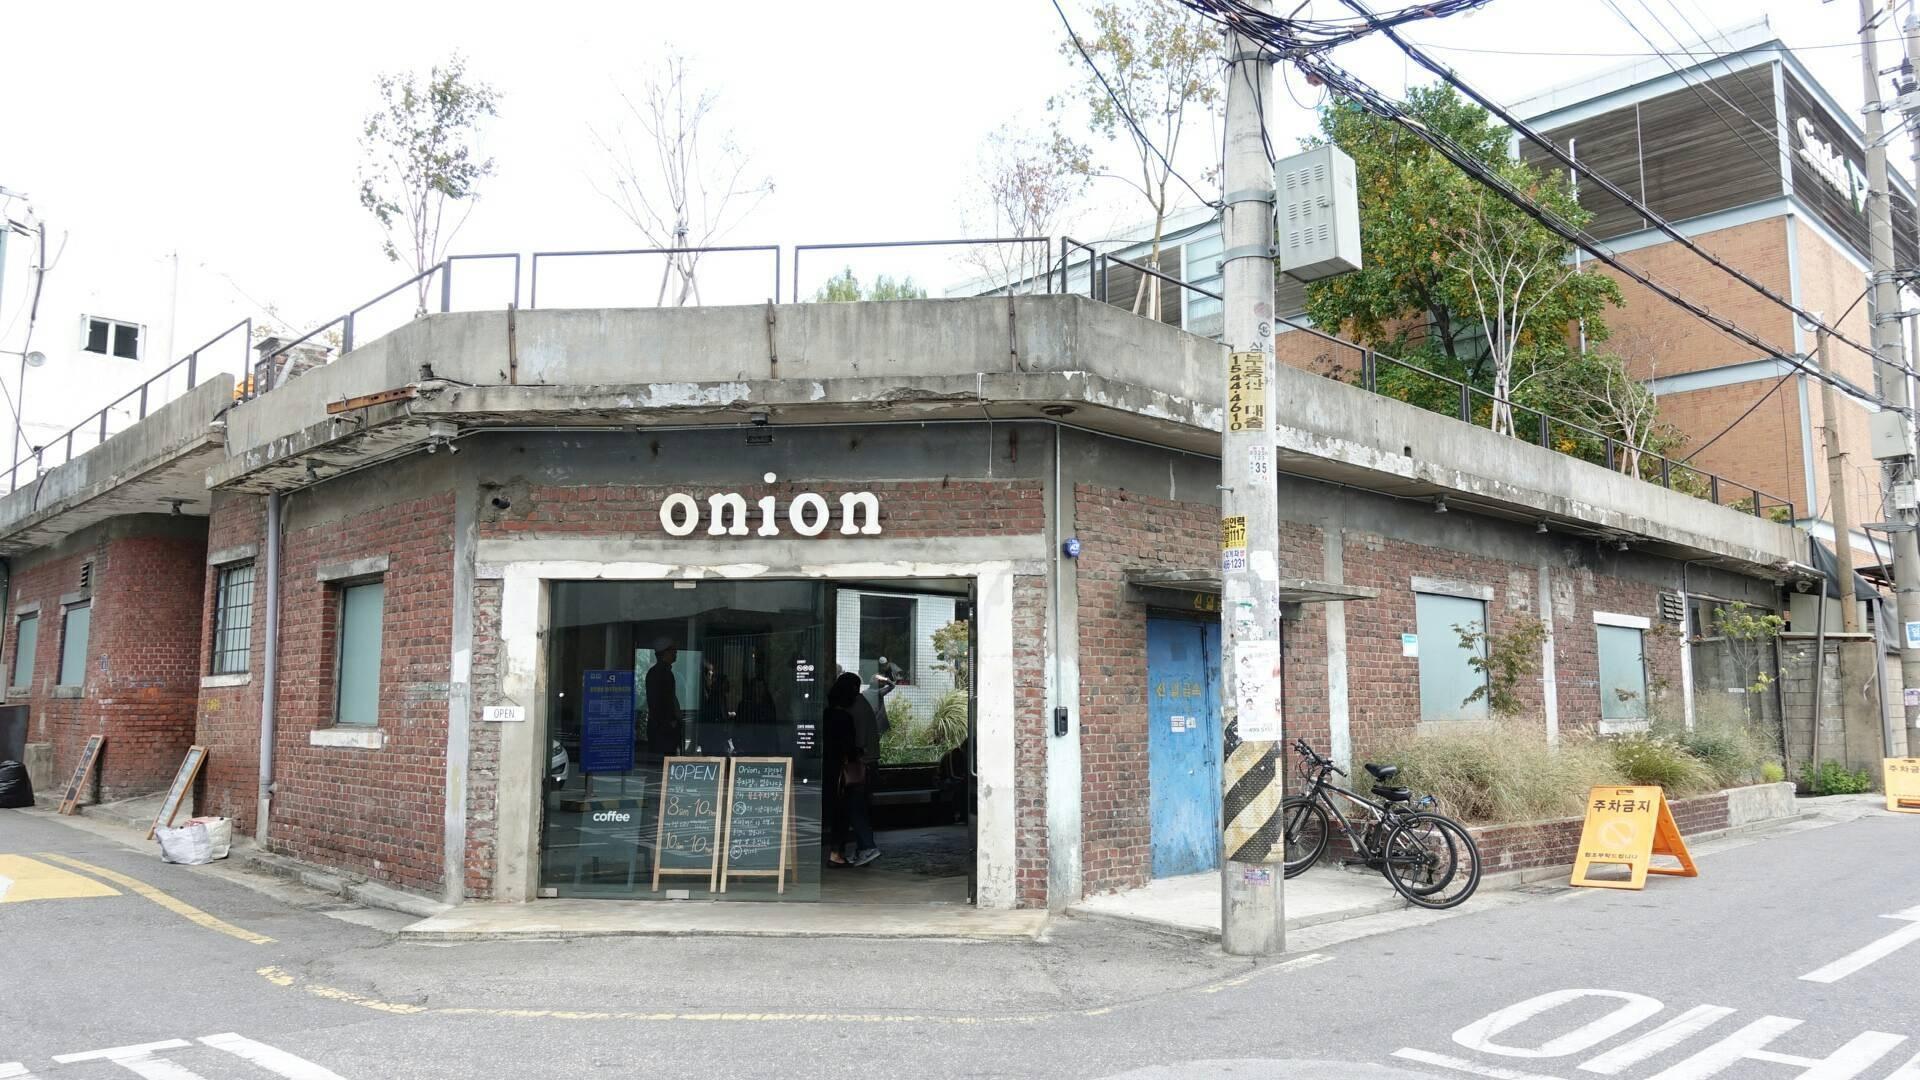 Onion Cafe